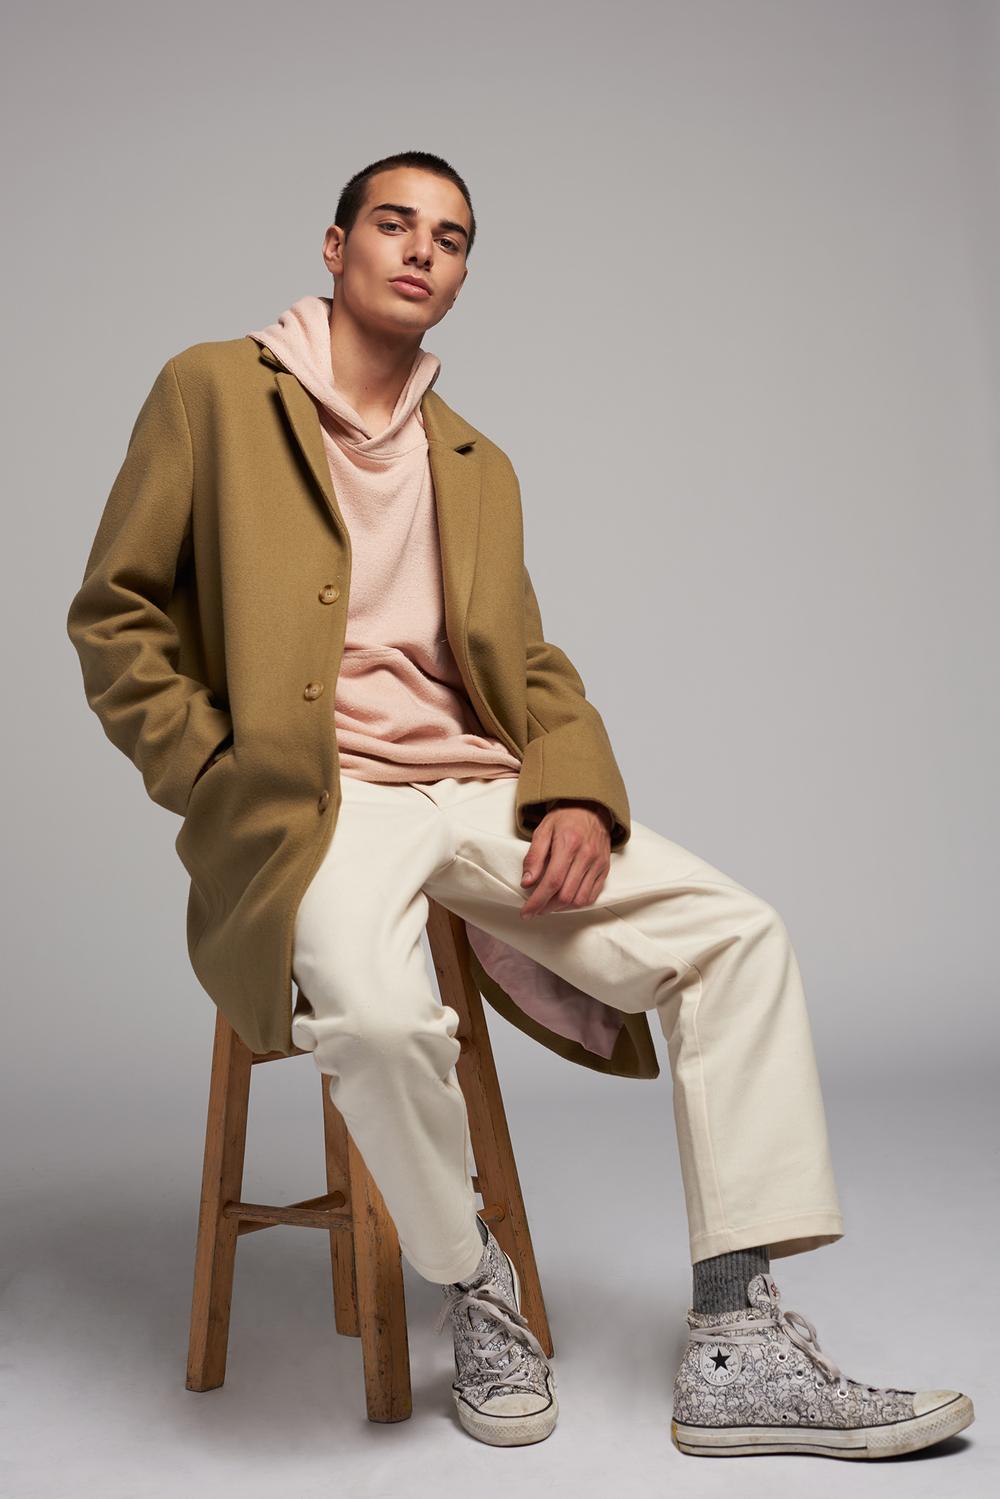 Overcoat & Pants  Bristol LA   Hoodie  Represent   Shoes  Converse